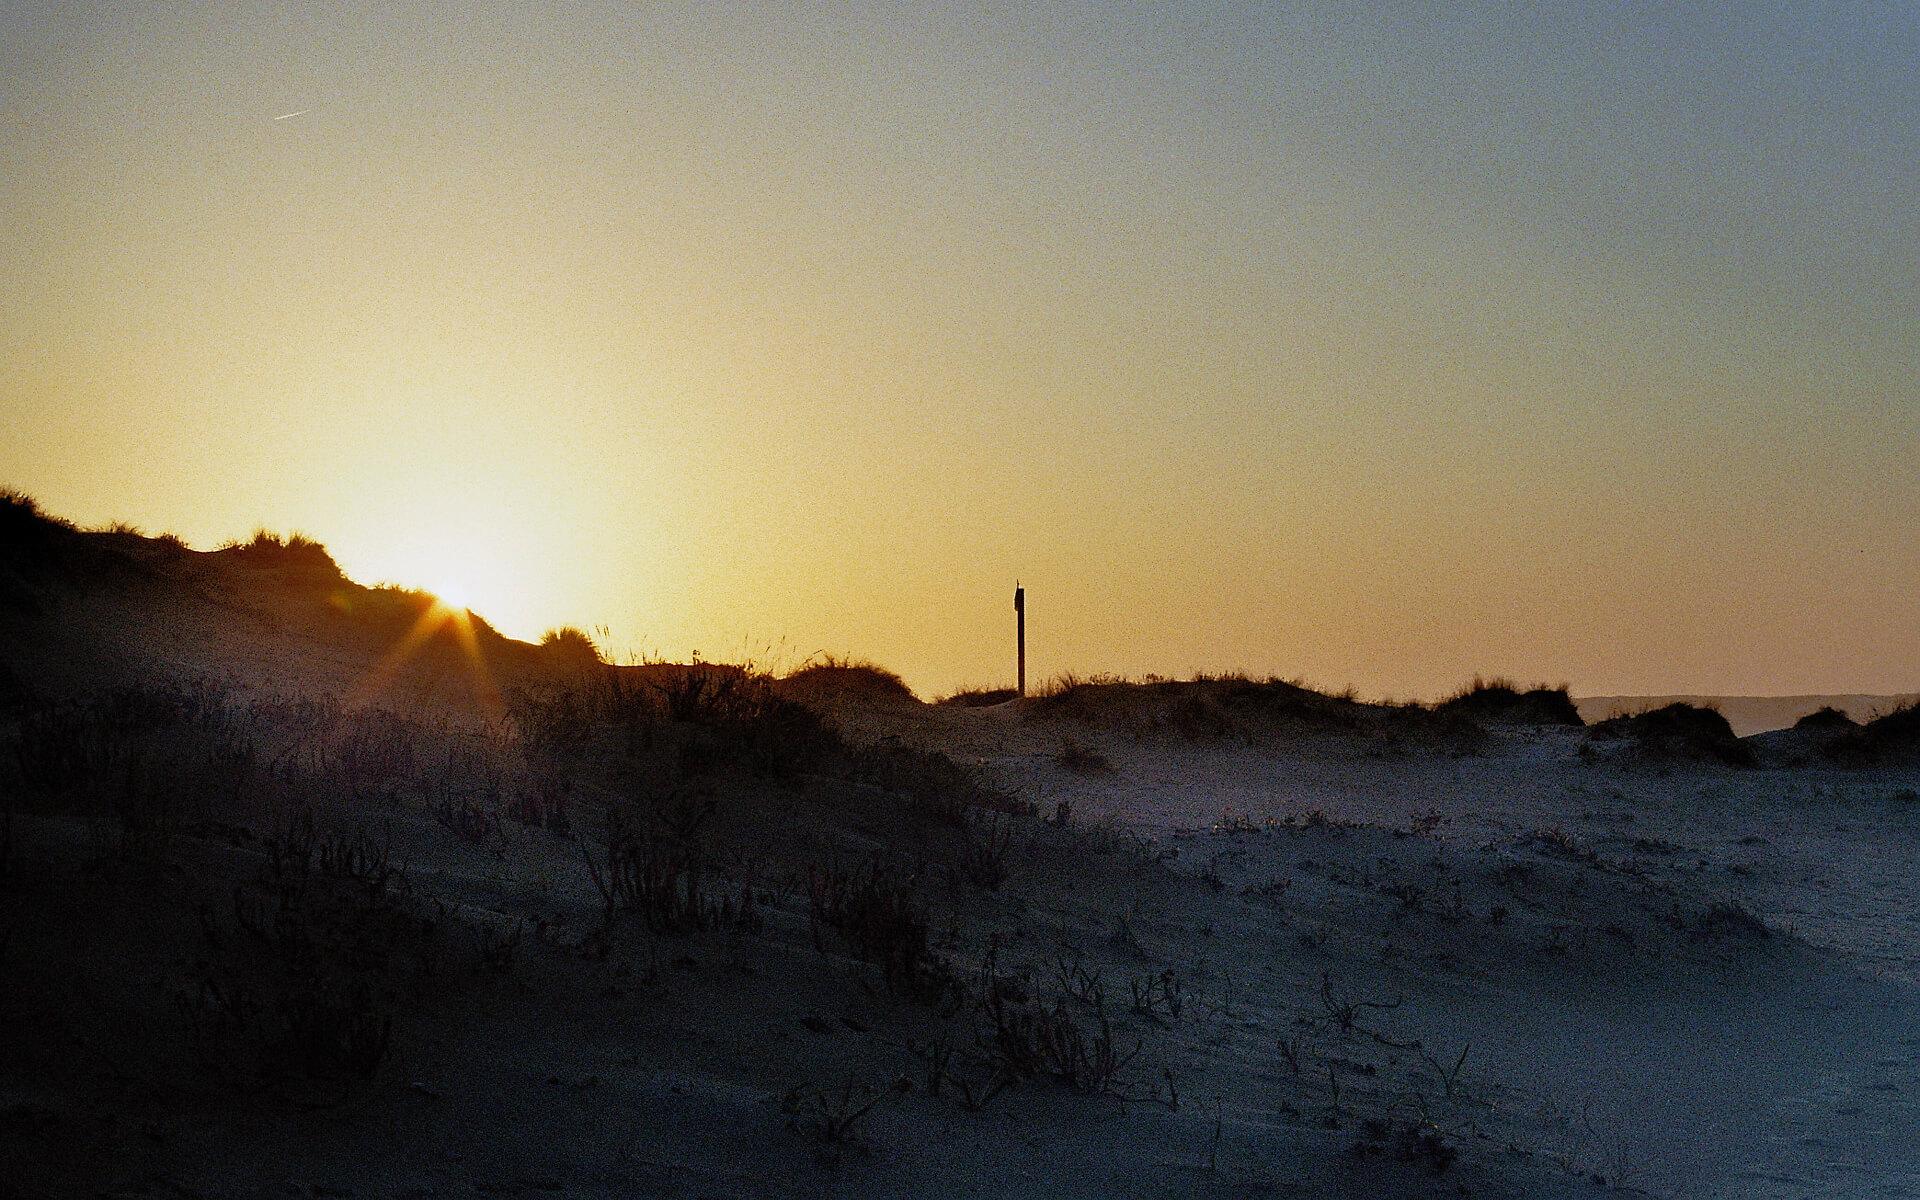 Sonnenuntergang Layback Intermediate Surfhouse Hausstrand Valdoviño